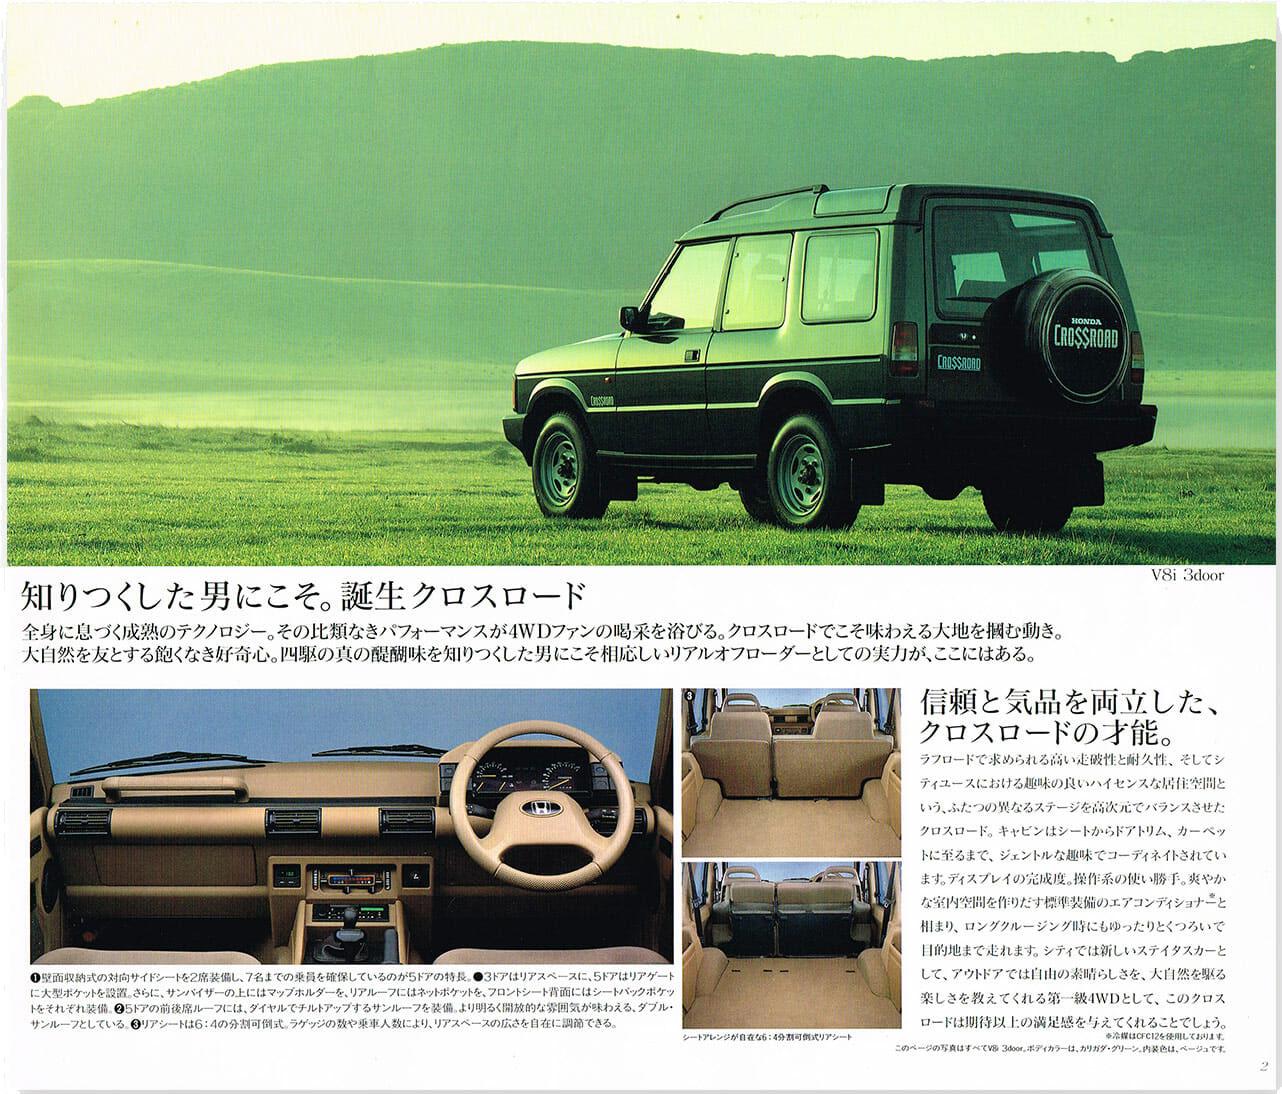 Honda-Crossroad-4